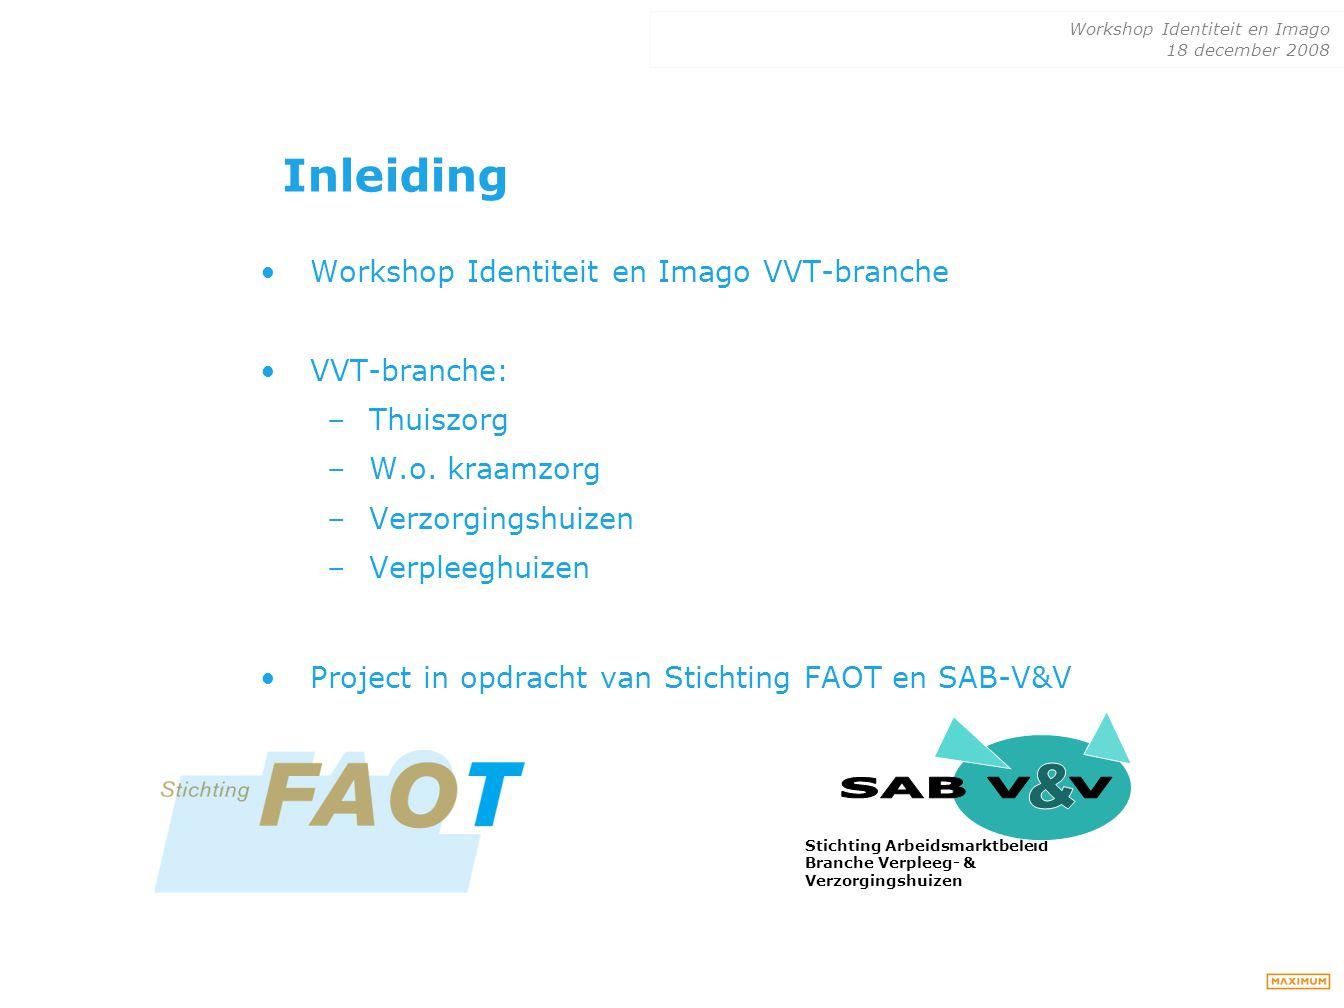 Workshop Identiteit en Imago 18 december 2008 Inleiding Workshop Identiteit en Imago VVT-branche VVT-branche: –Thuiszorg –W.o. kraamzorg –Verzorgingsh